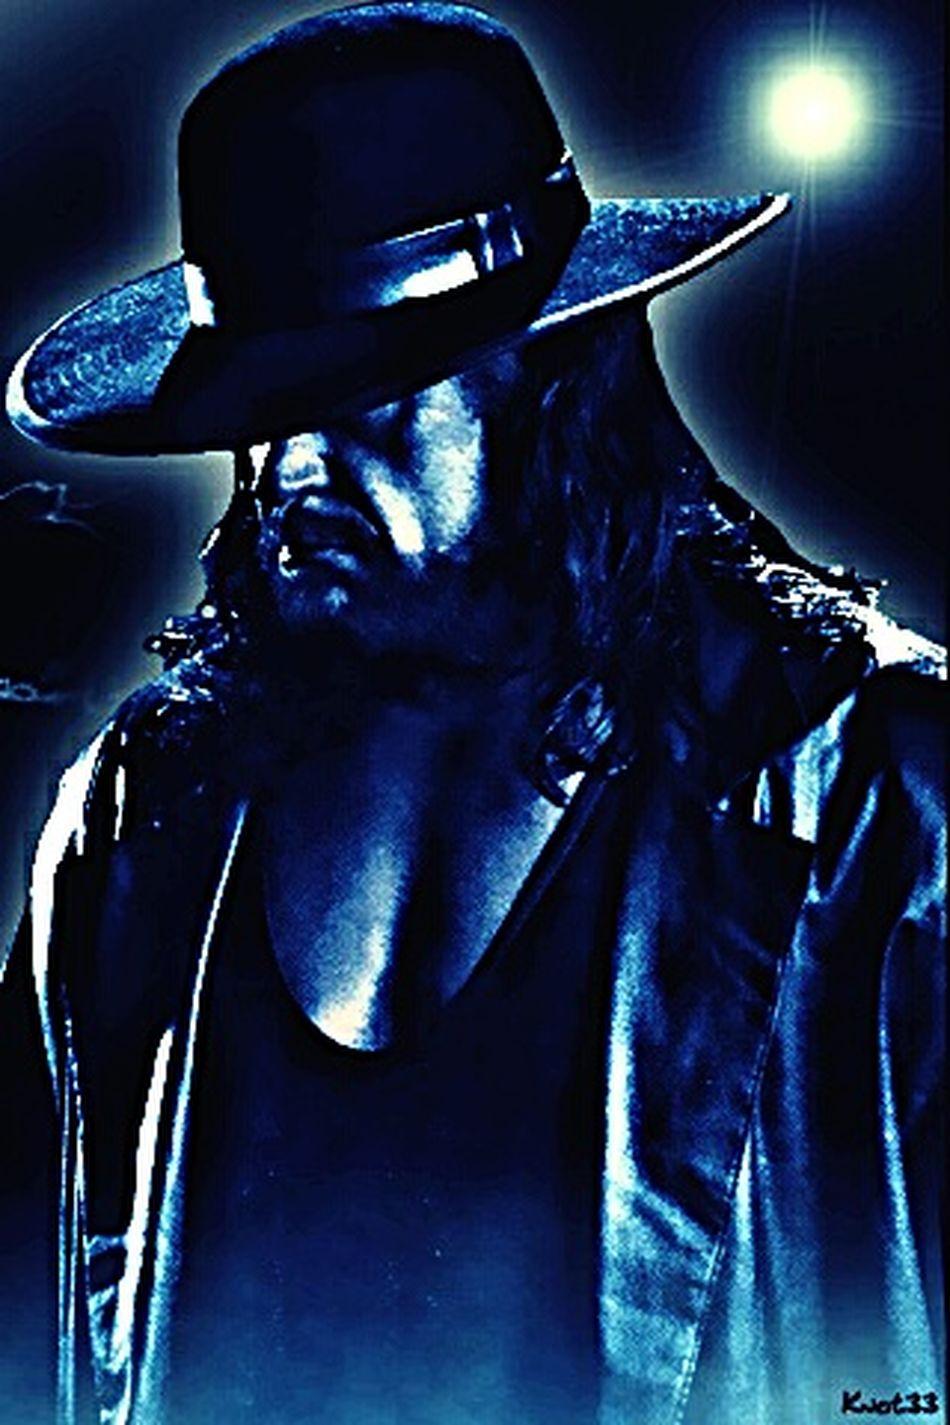 Undertaker. Undertaker  The Undertaker Wwe 25years Raw Smackdown Wwf Kane  Undertaker !! WWE RAW Wwe TheUndertaker Undertaker